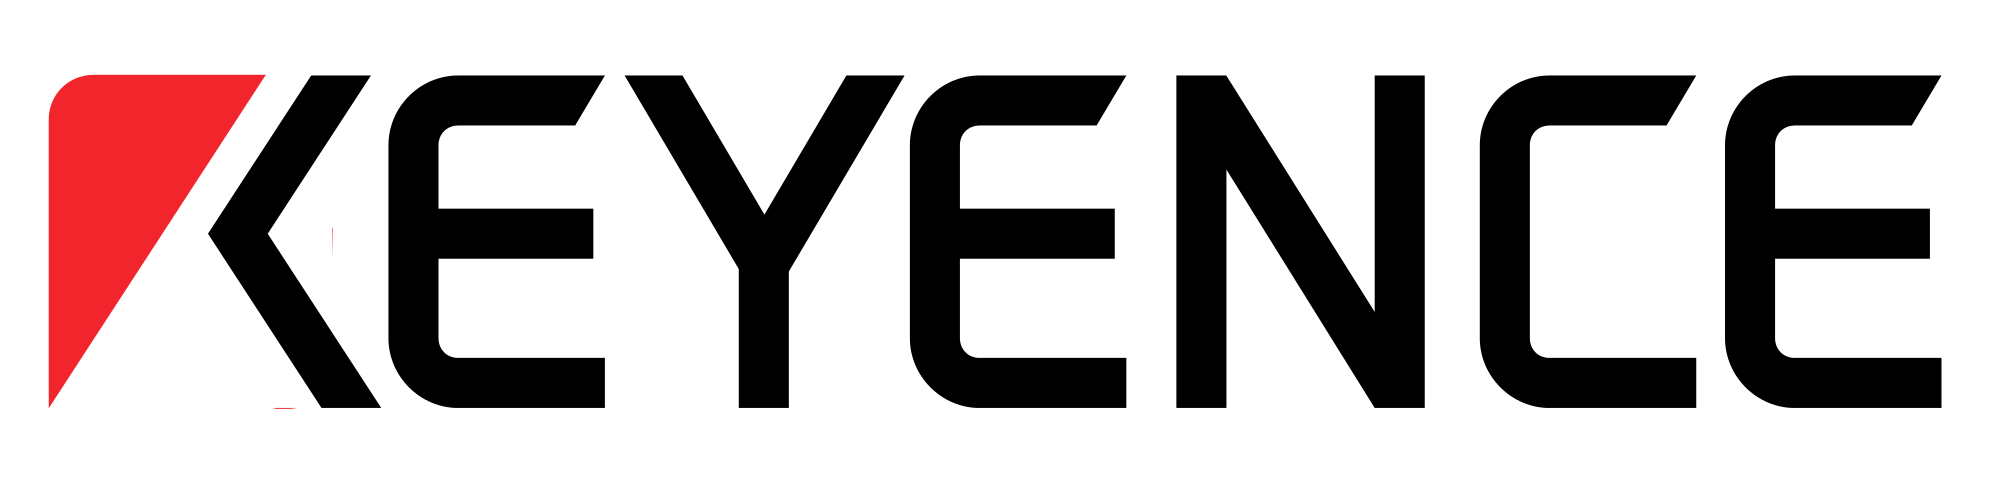 Keyence-Logo.png